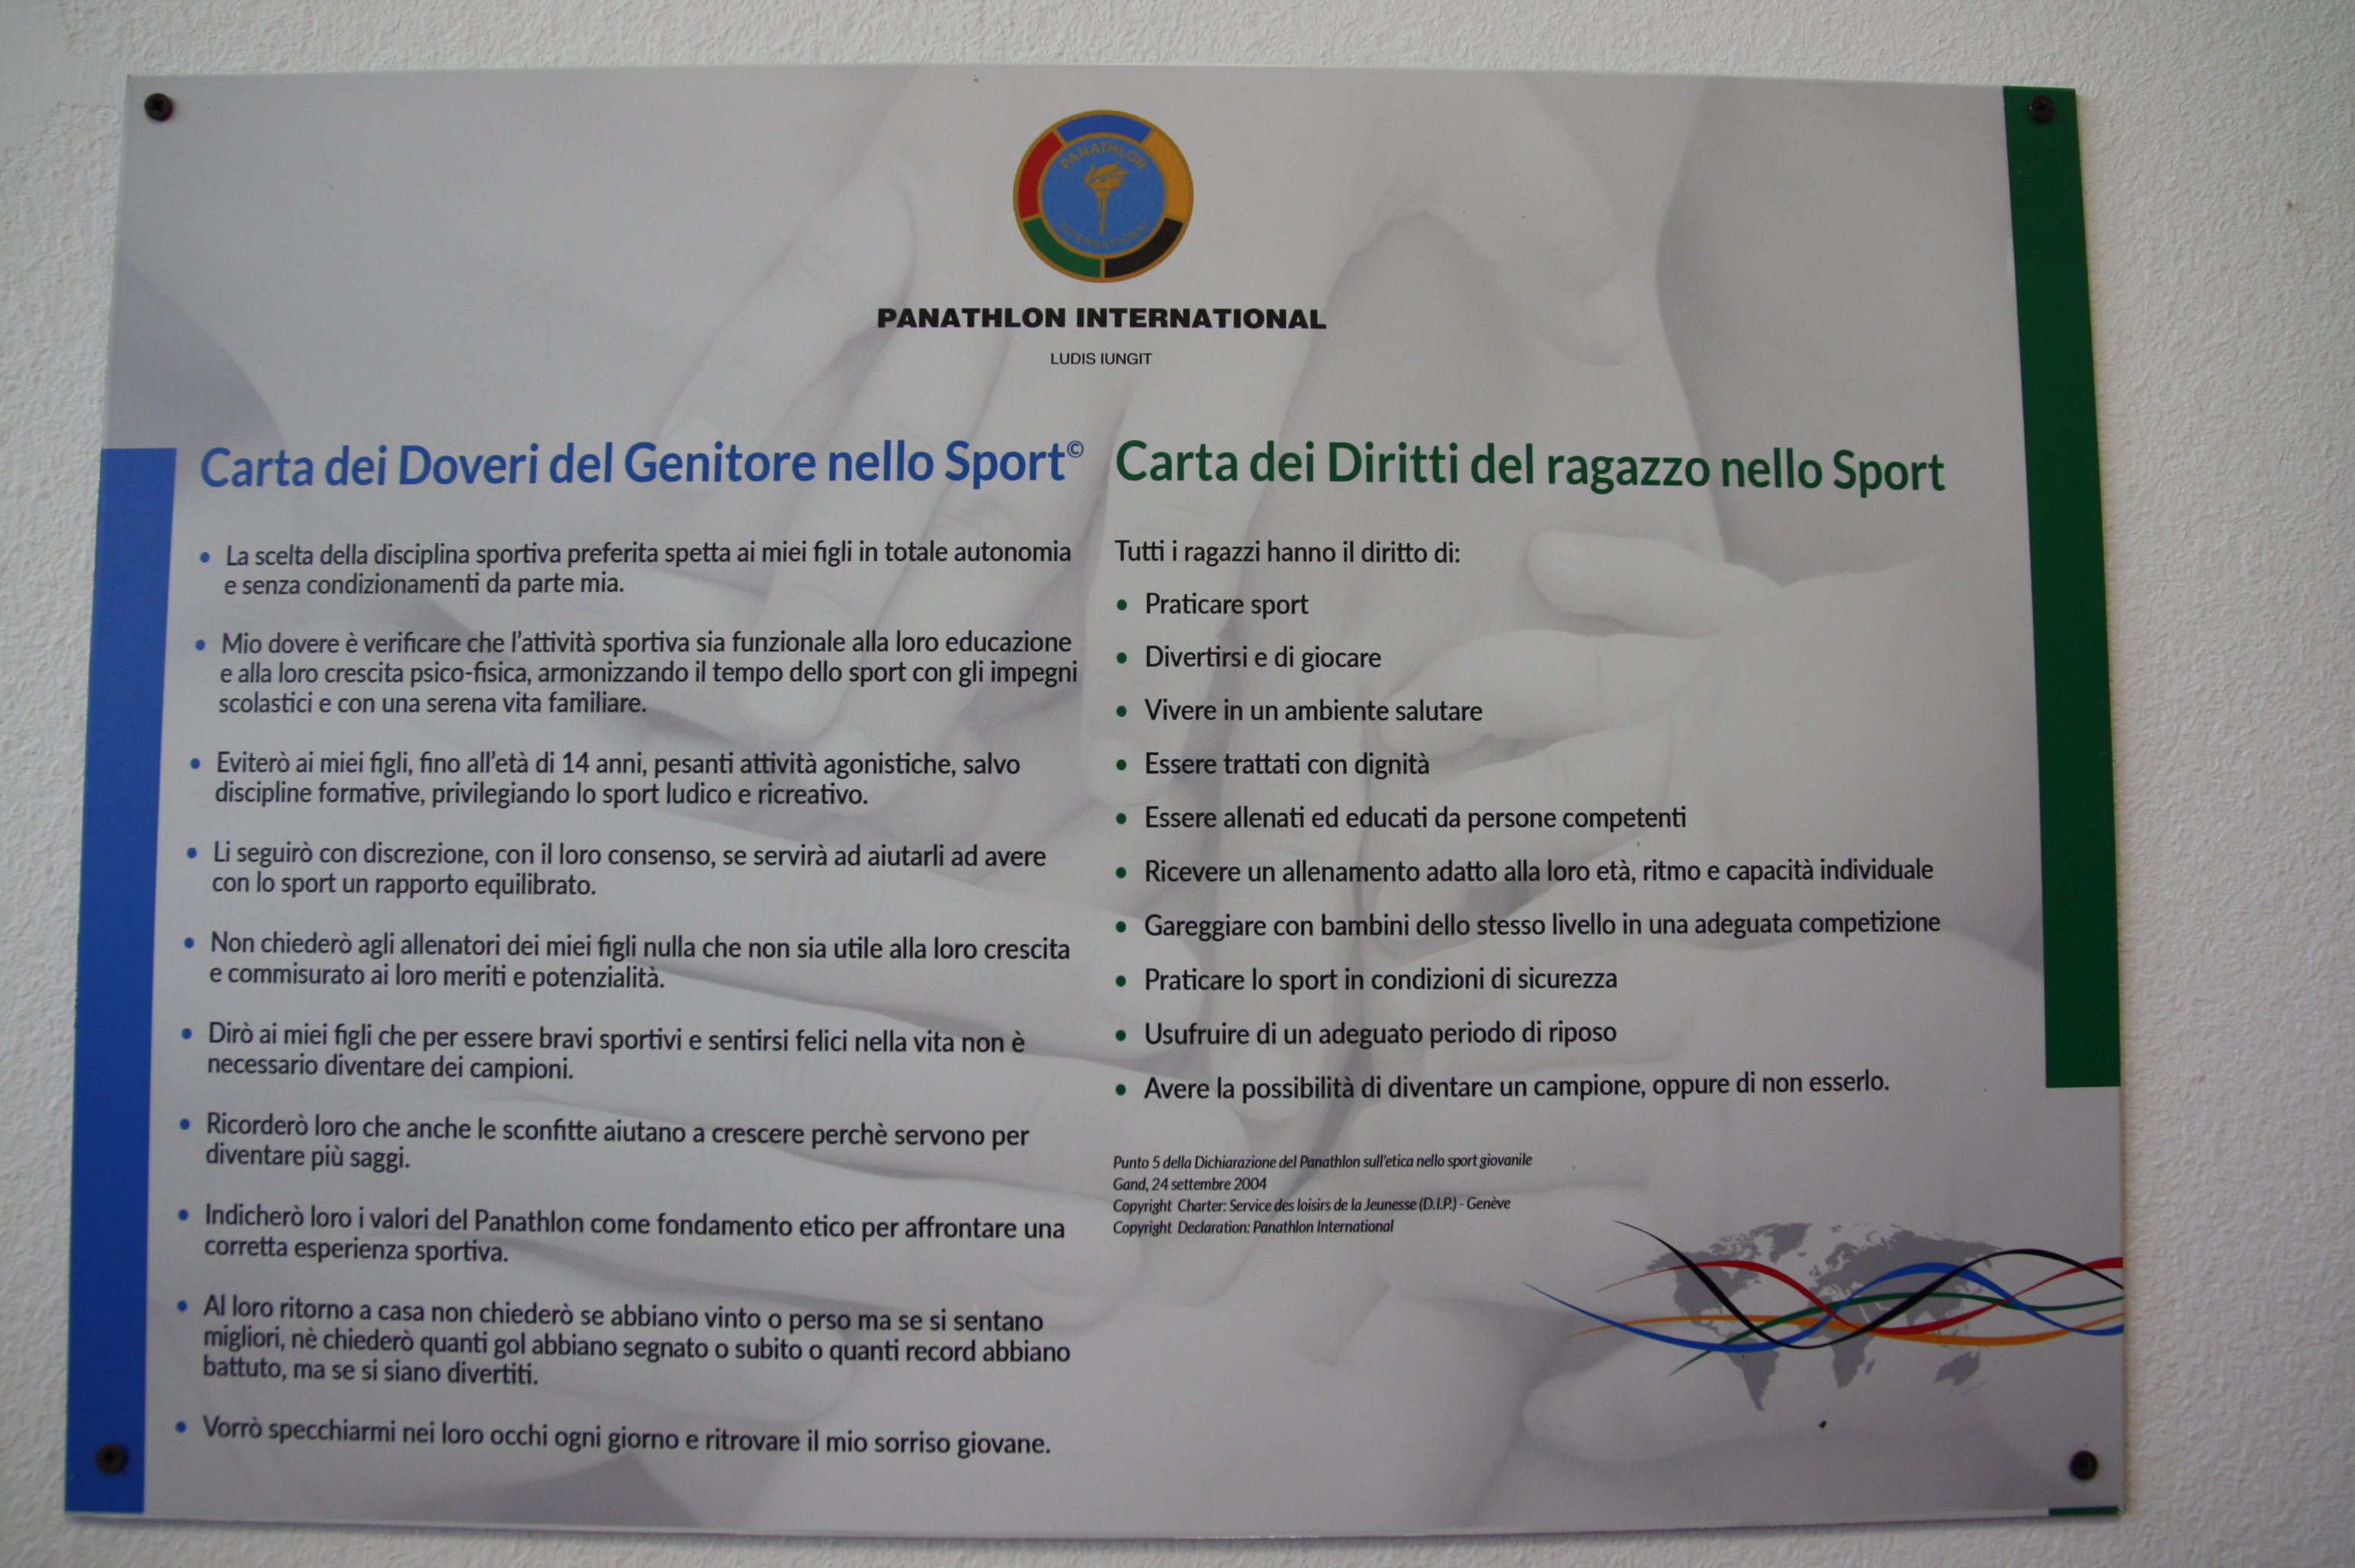 targhe Panathlon014.JPG